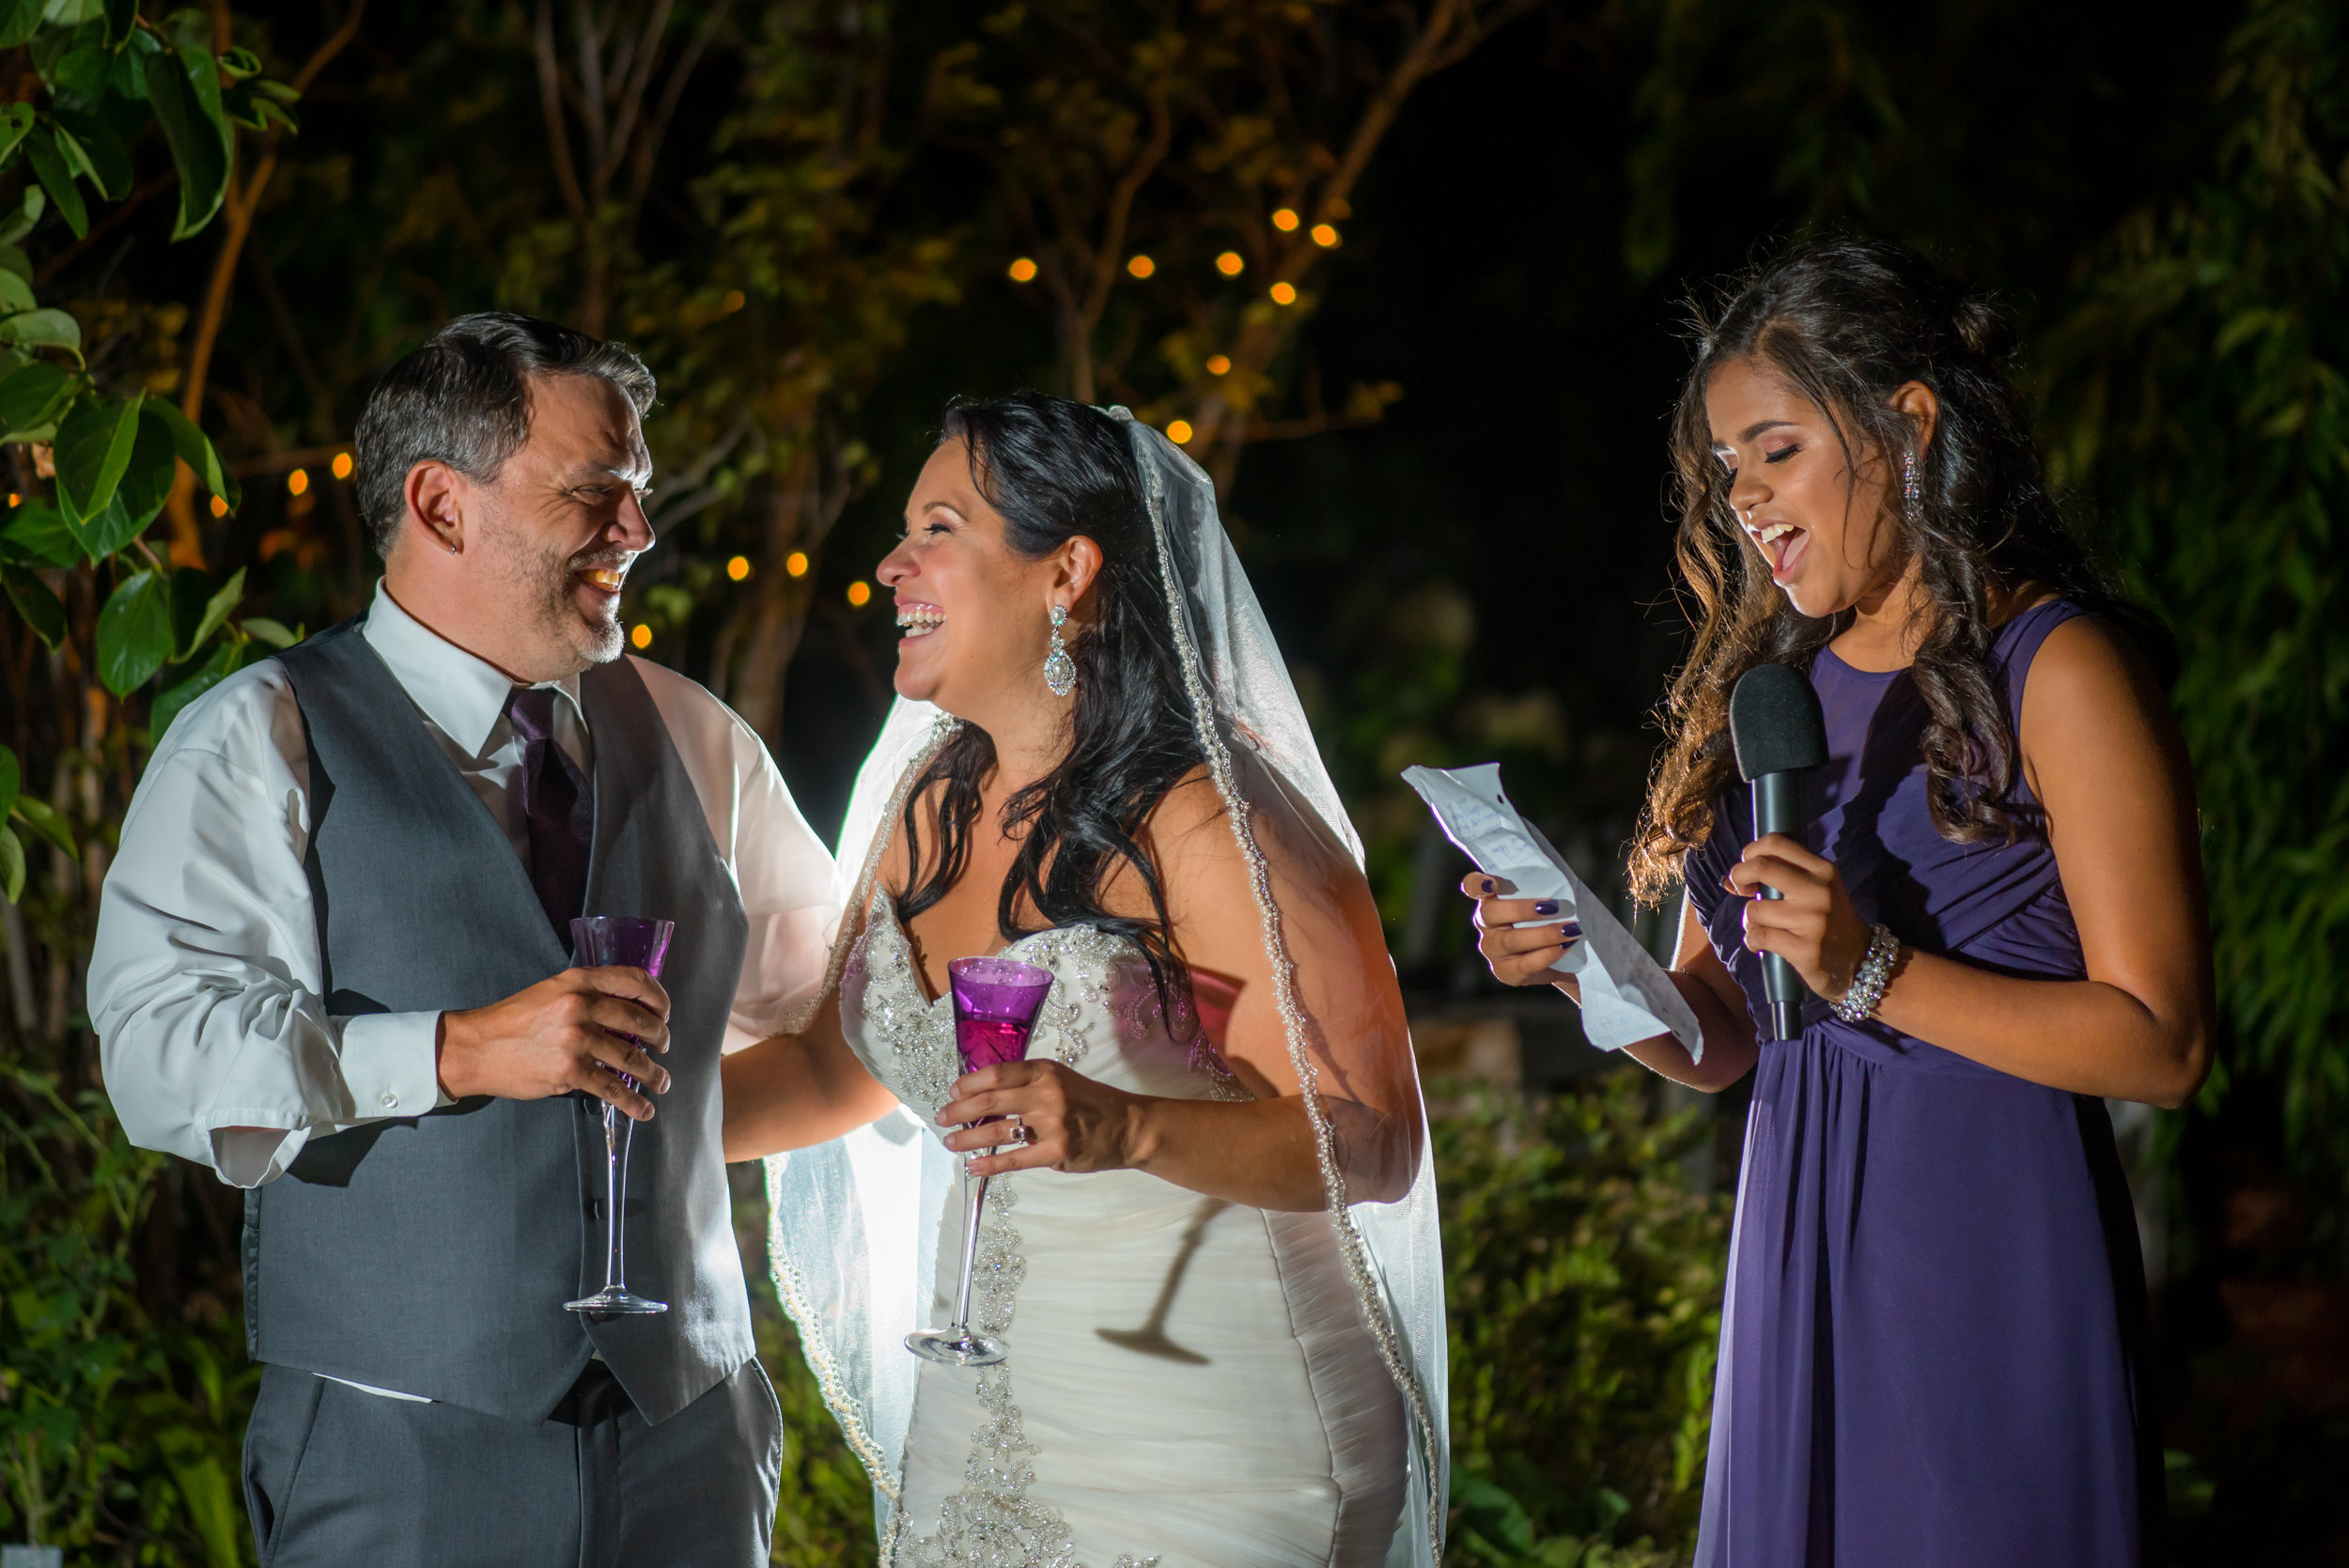 erika-seth-032-monte-verde-inn-sacramento-wedding-photographer-katherine-nicole-photography.JPG